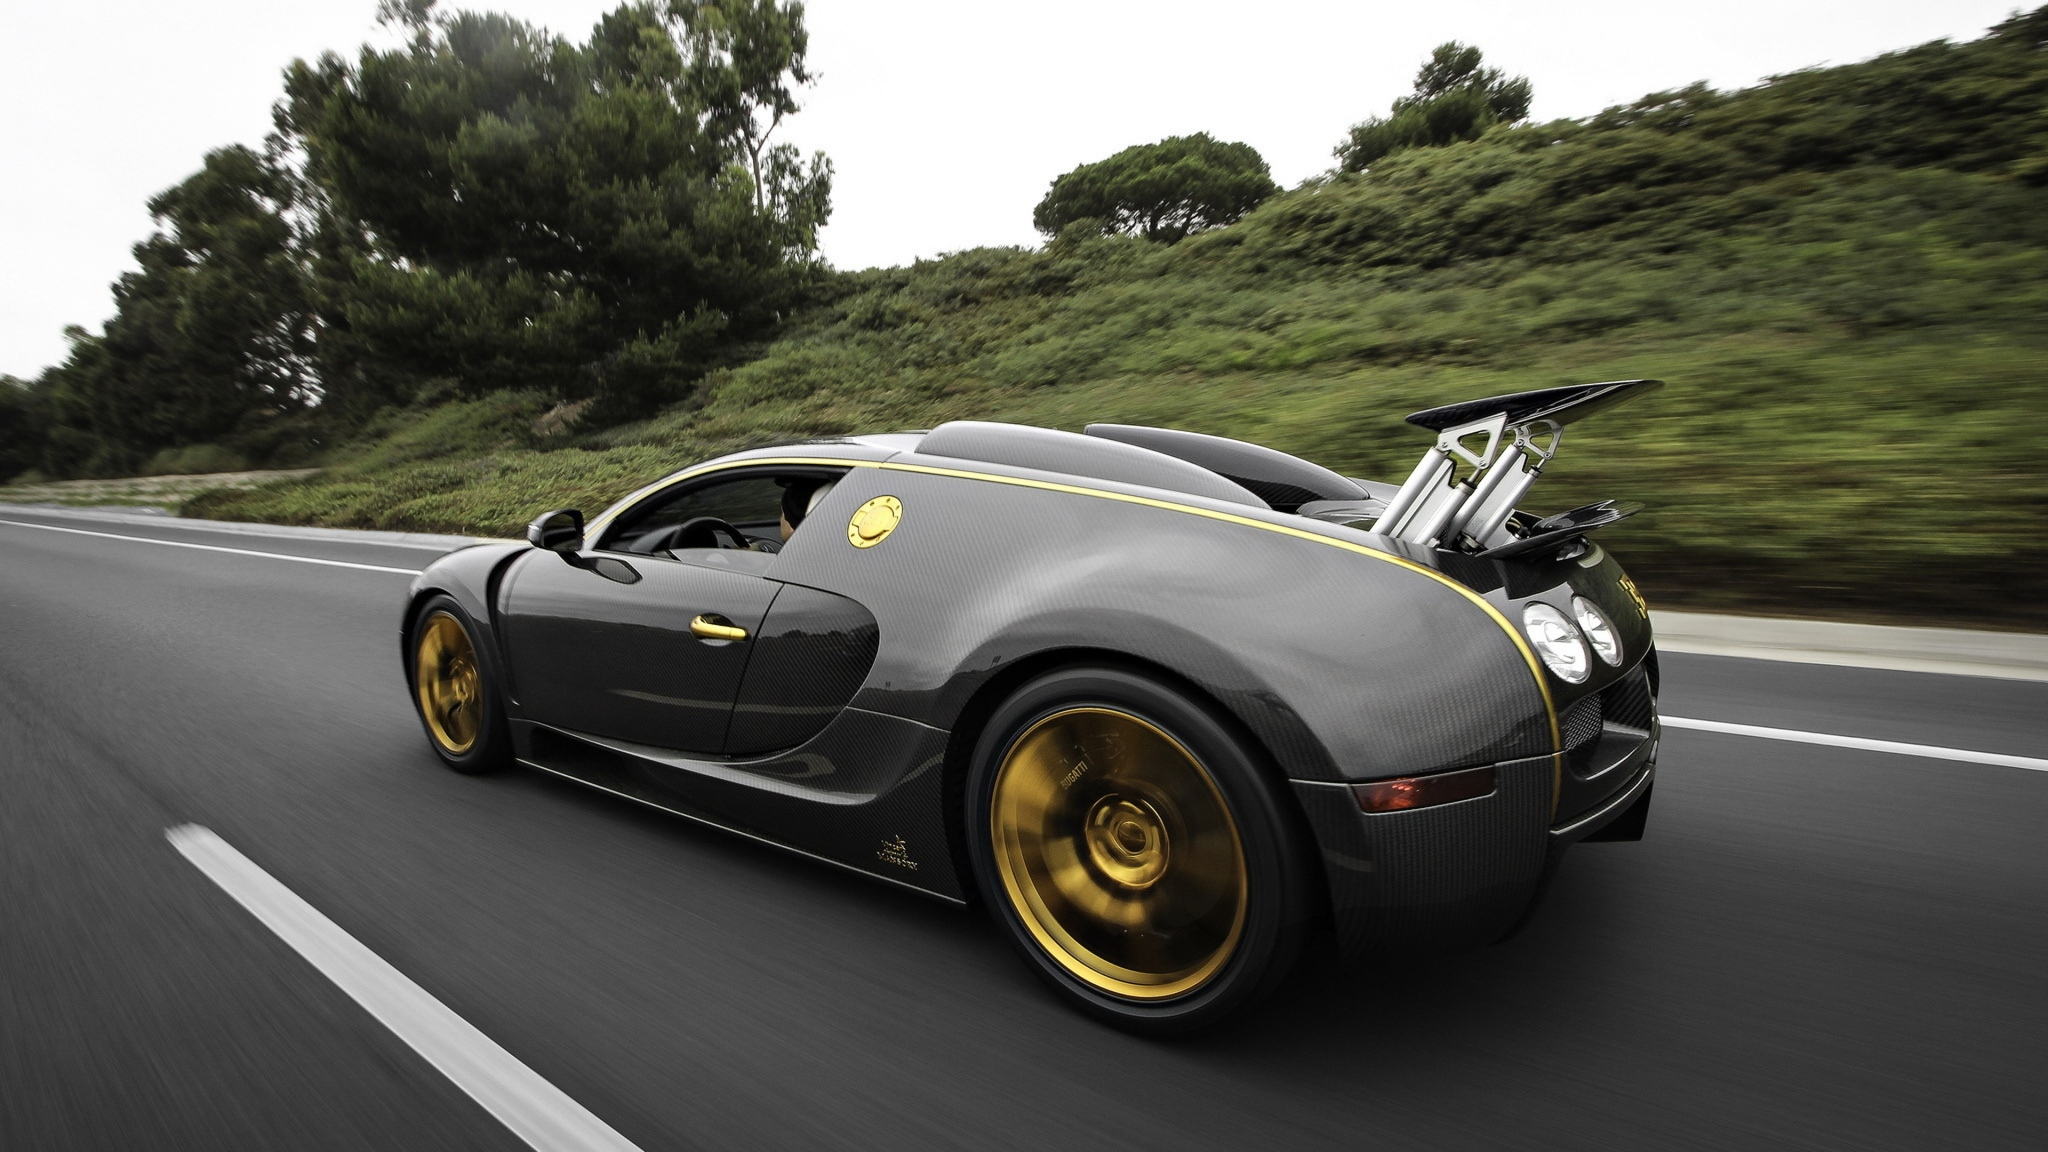 bugatti-veyron-custom-2048x1152 Astounding Bugatti Veyron Need for Speed World Cars Trend